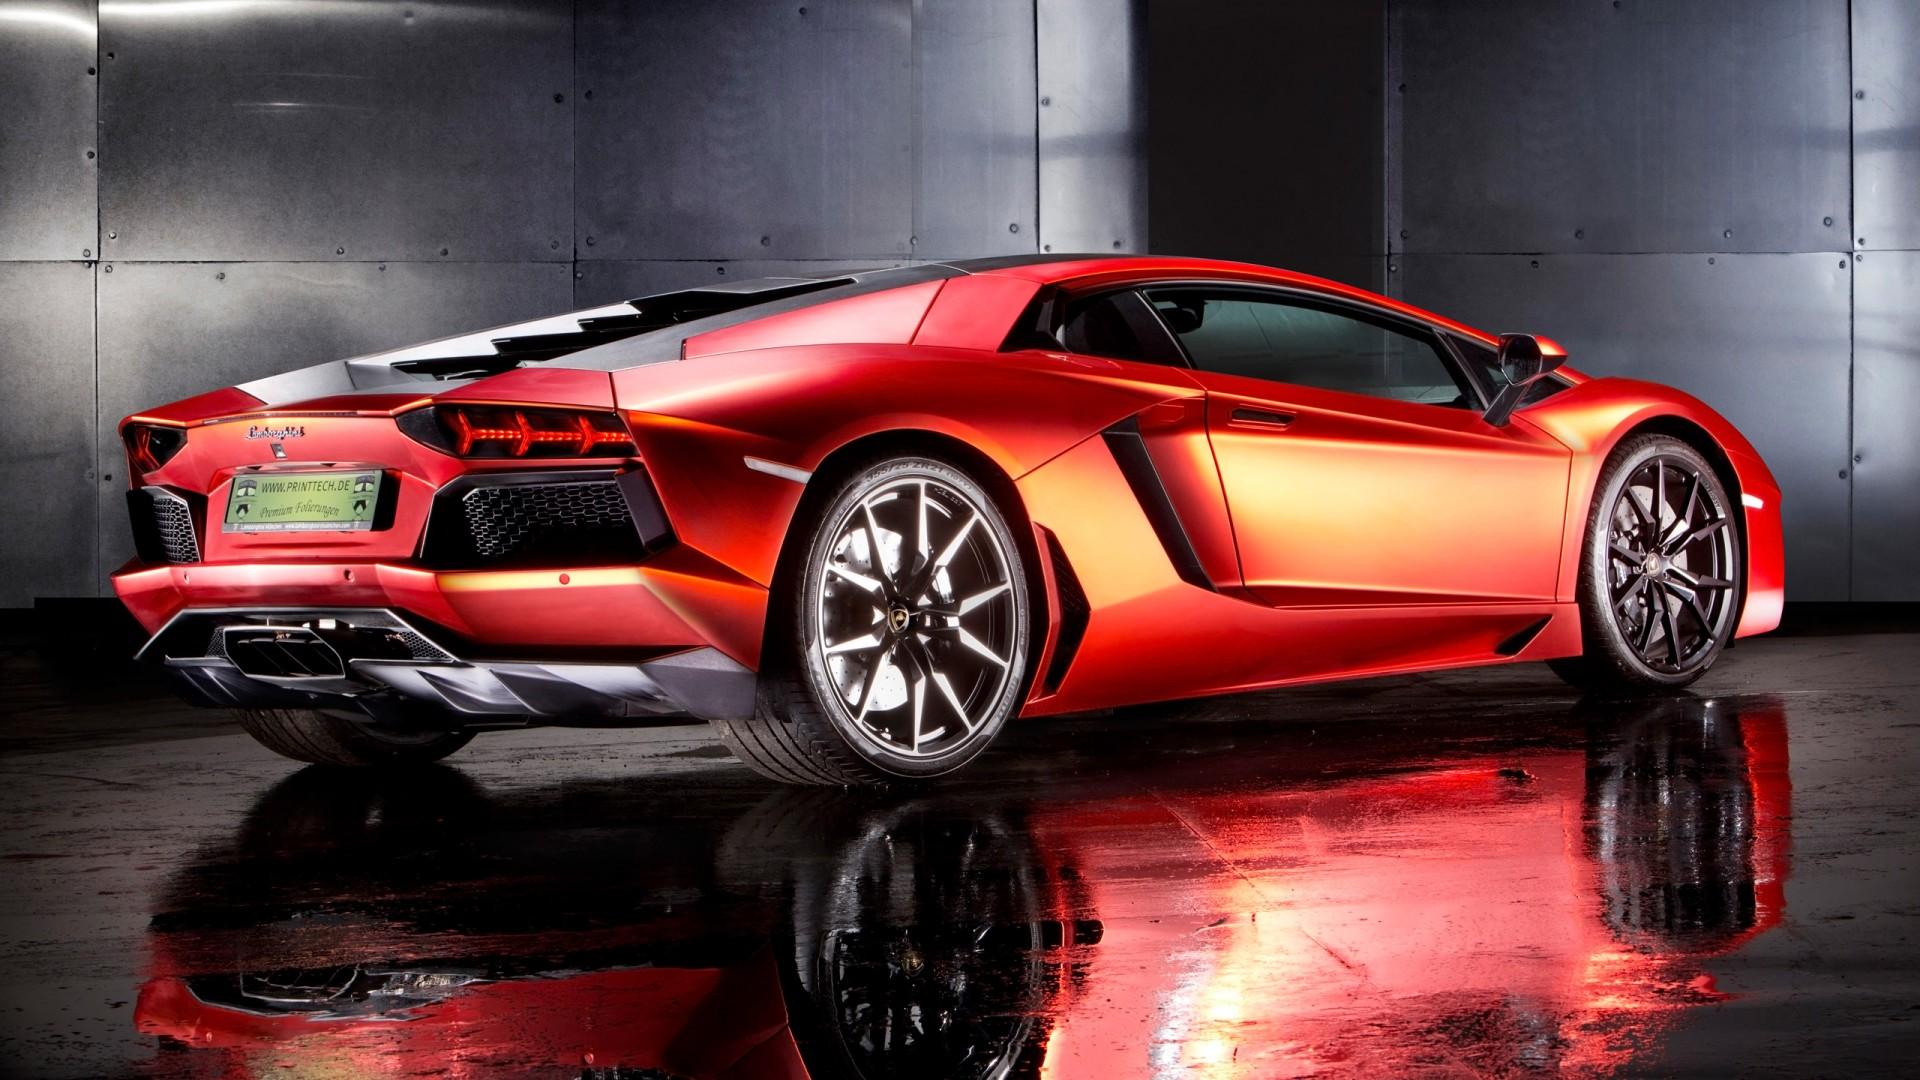 2013 Lamborghini Aventador By Print Tech 2 Wallpaper | HD ...